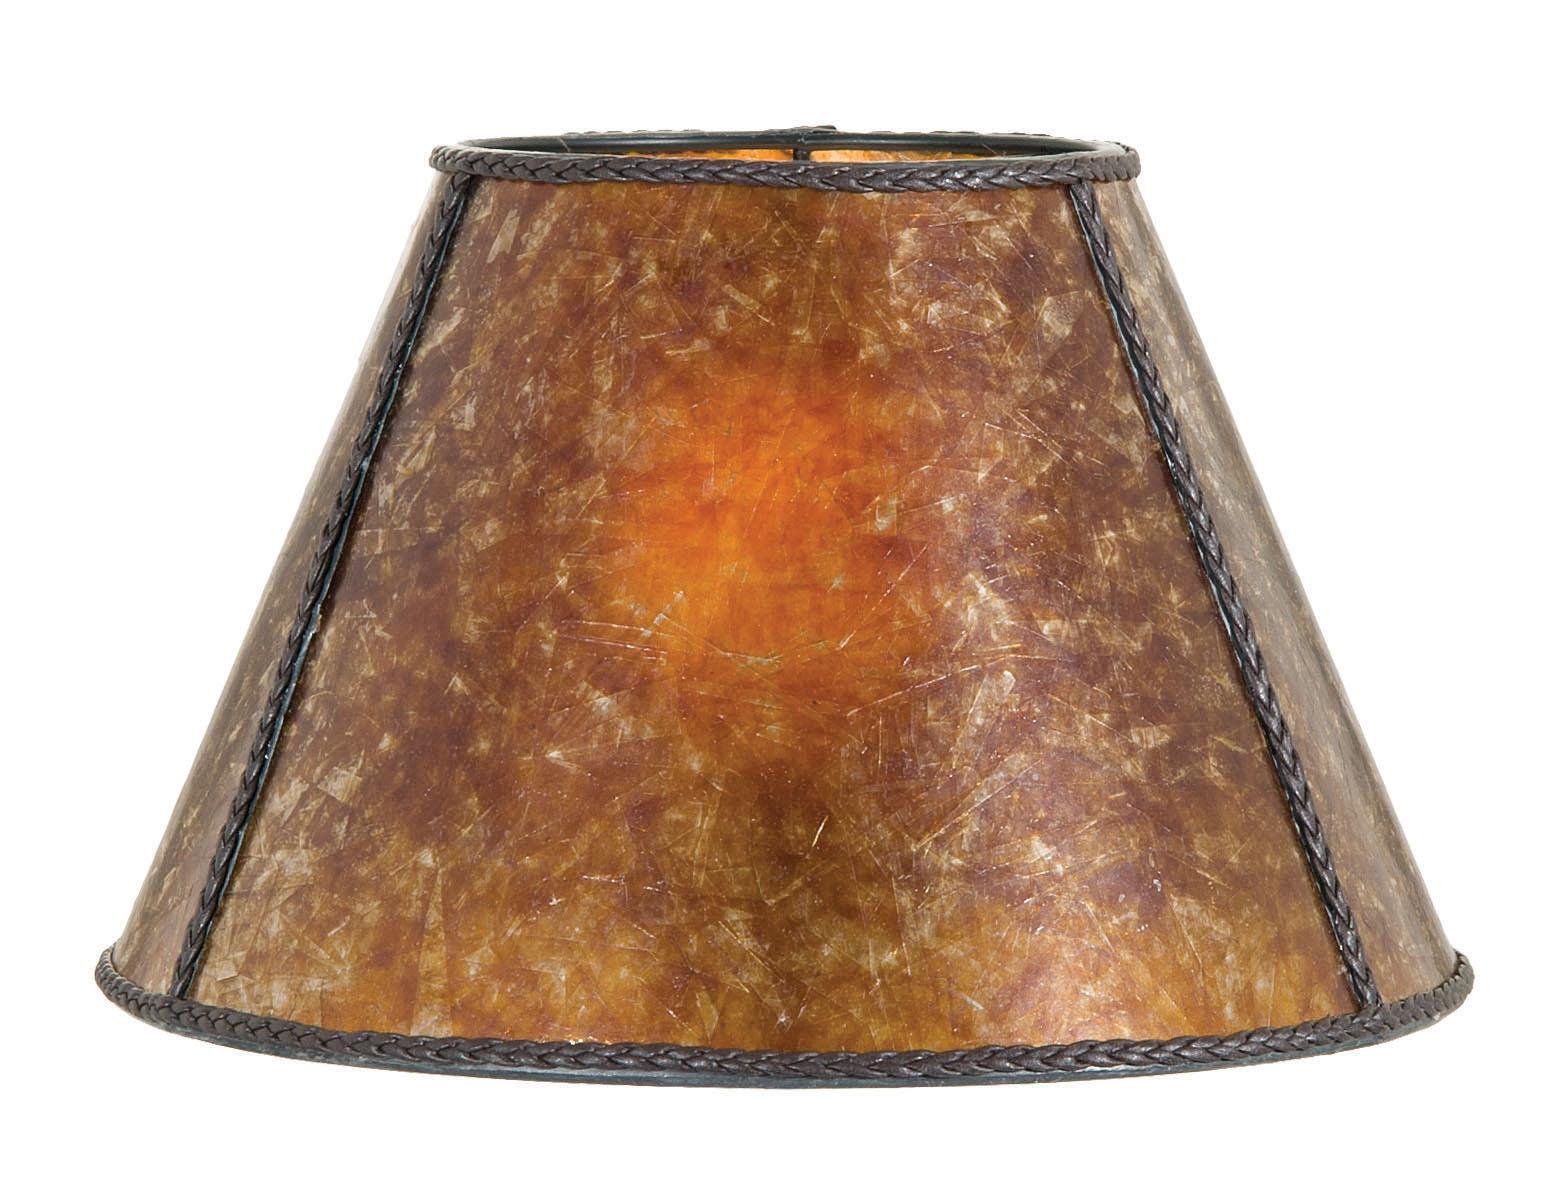 Amber empire style mica lamp shade 05717m bp lamp supply 05717m amber empire style mica lamp shade aloadofball Images